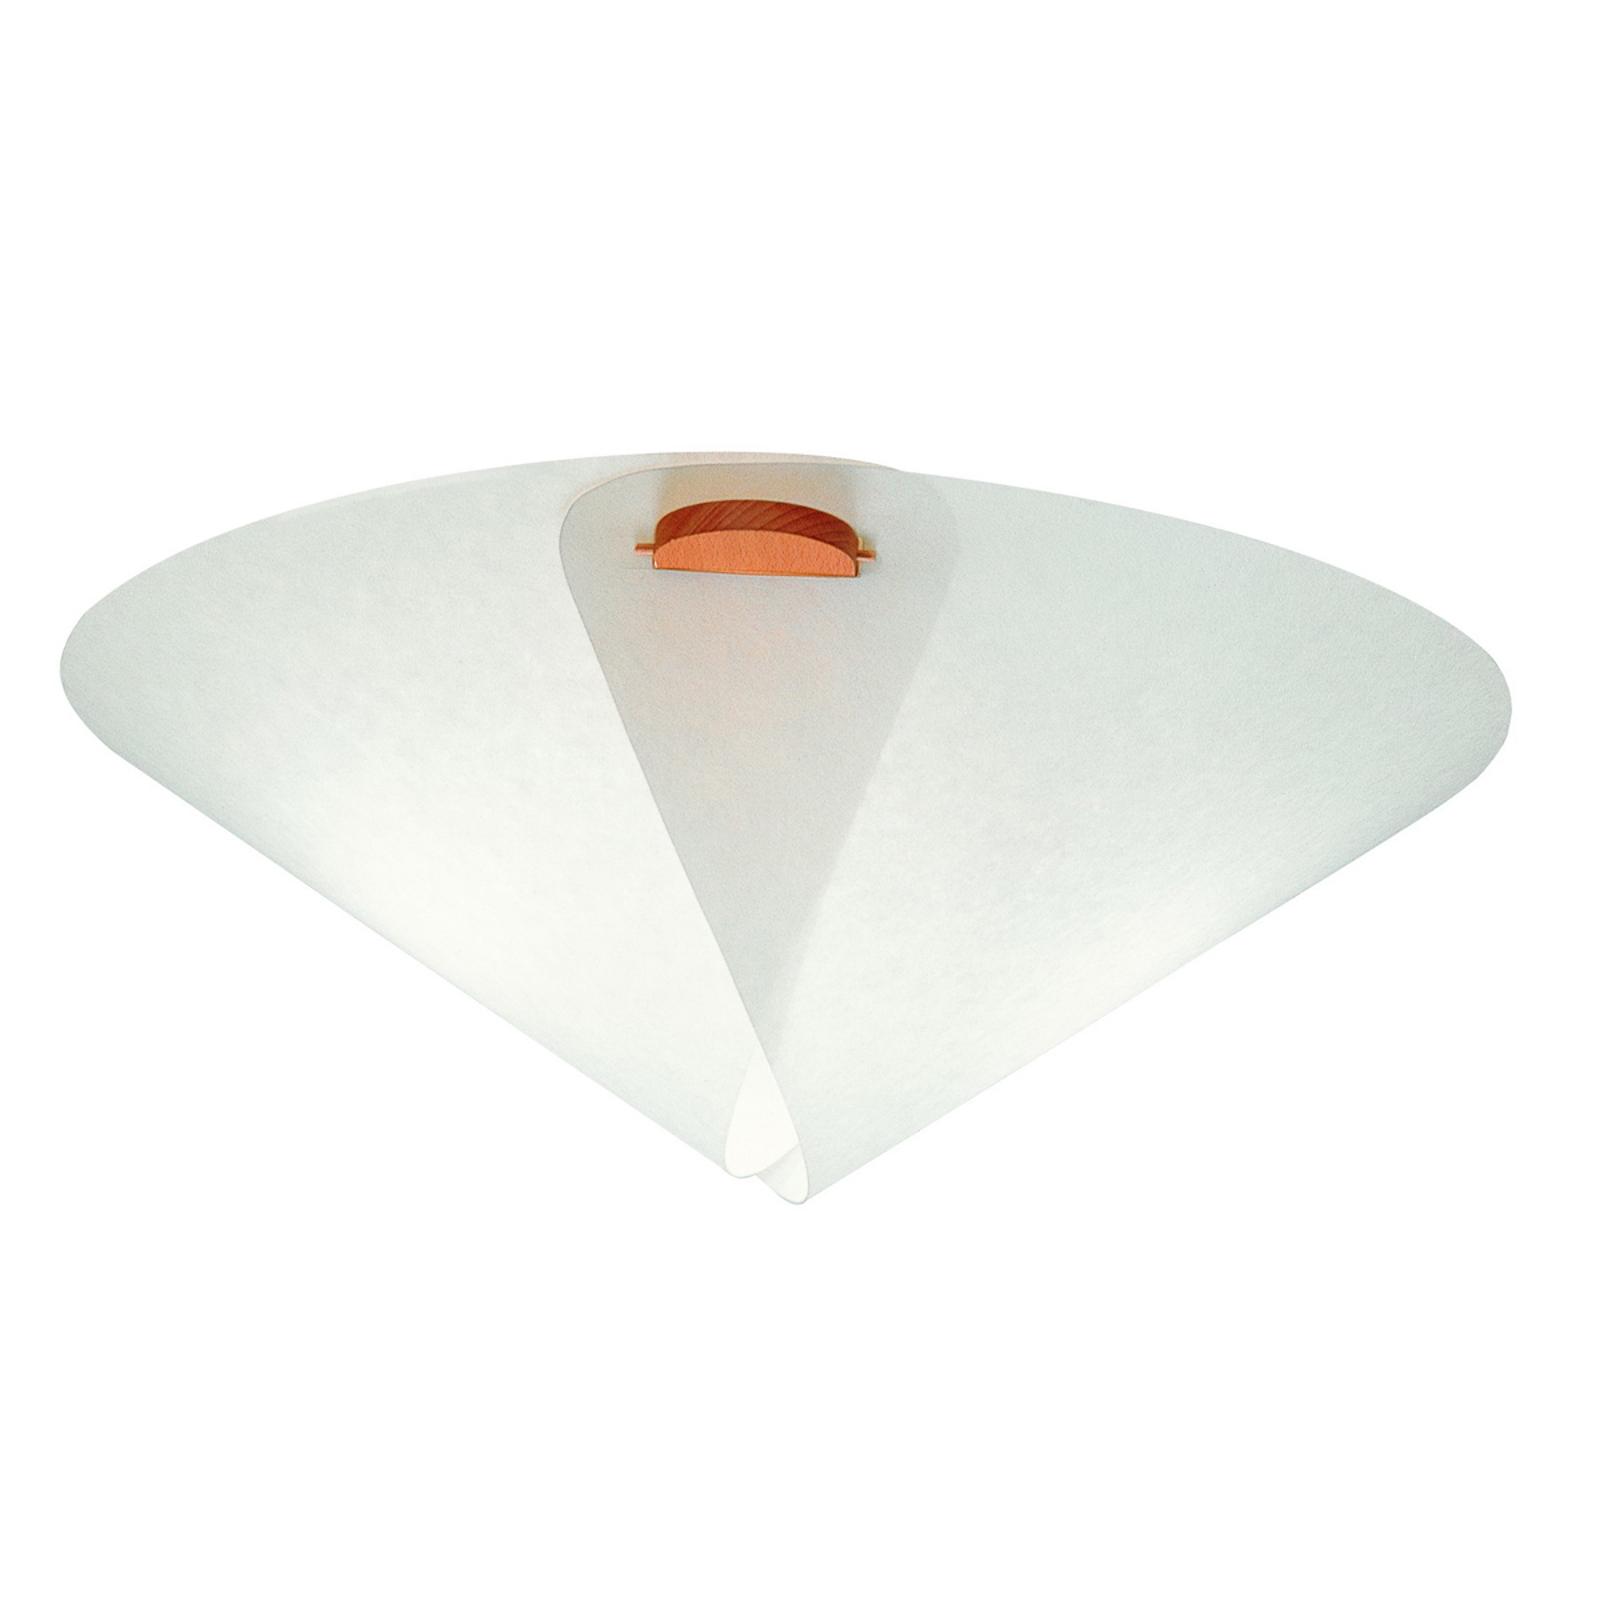 Round Ceiling light IRIS by Domus_2600147_1